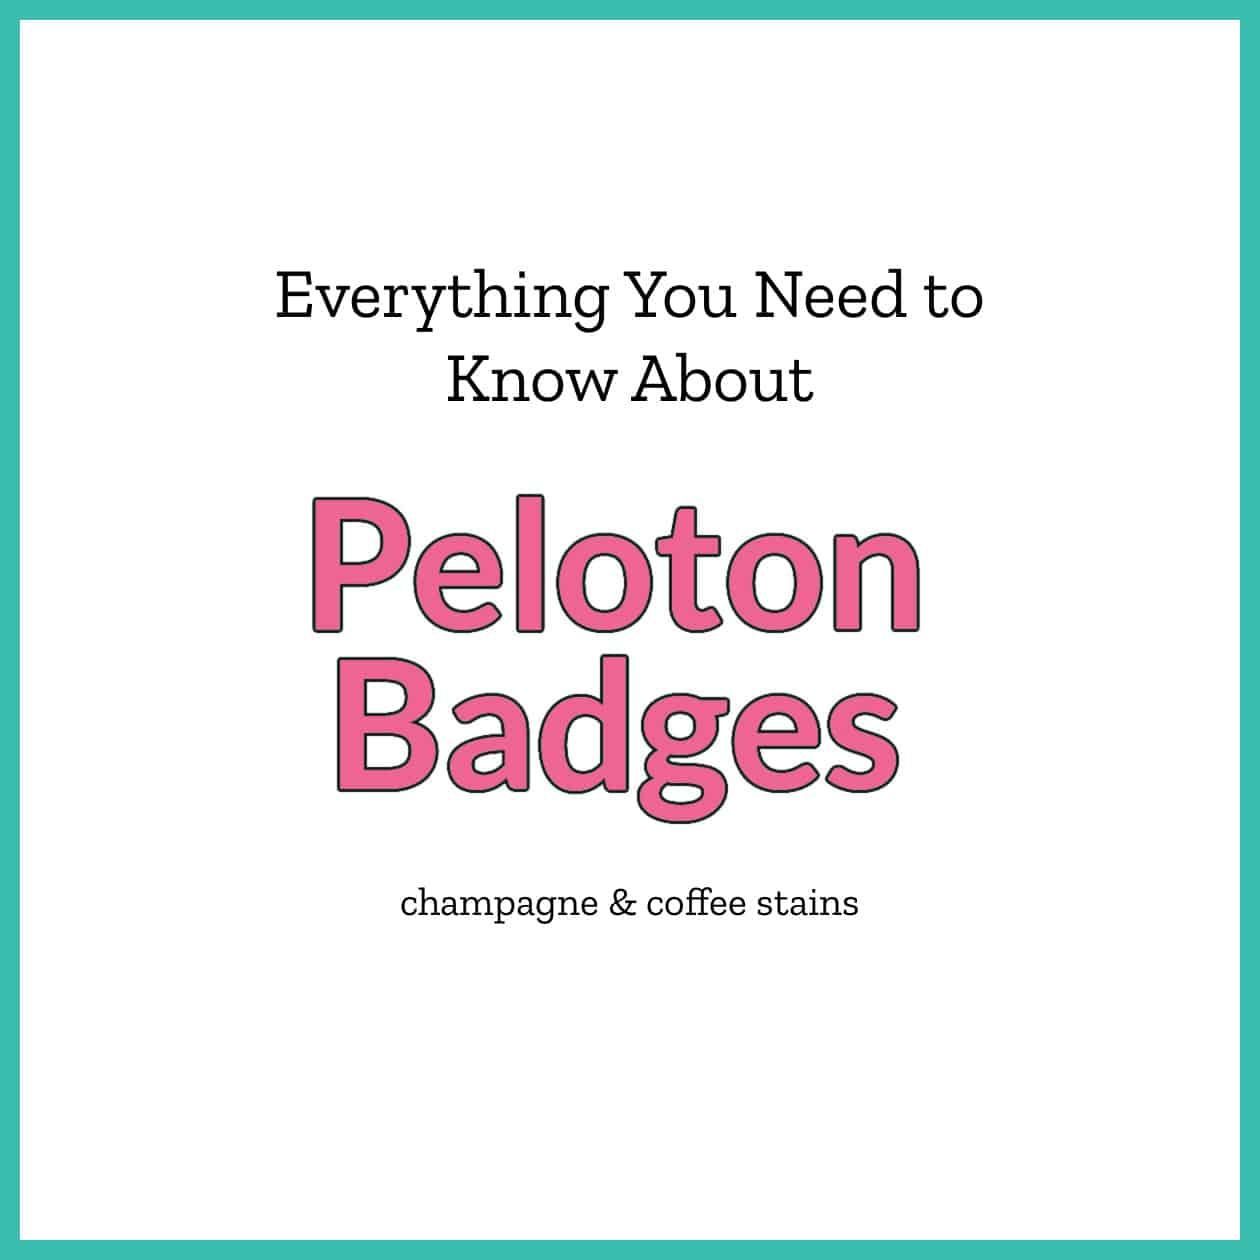 peloton badge blog image